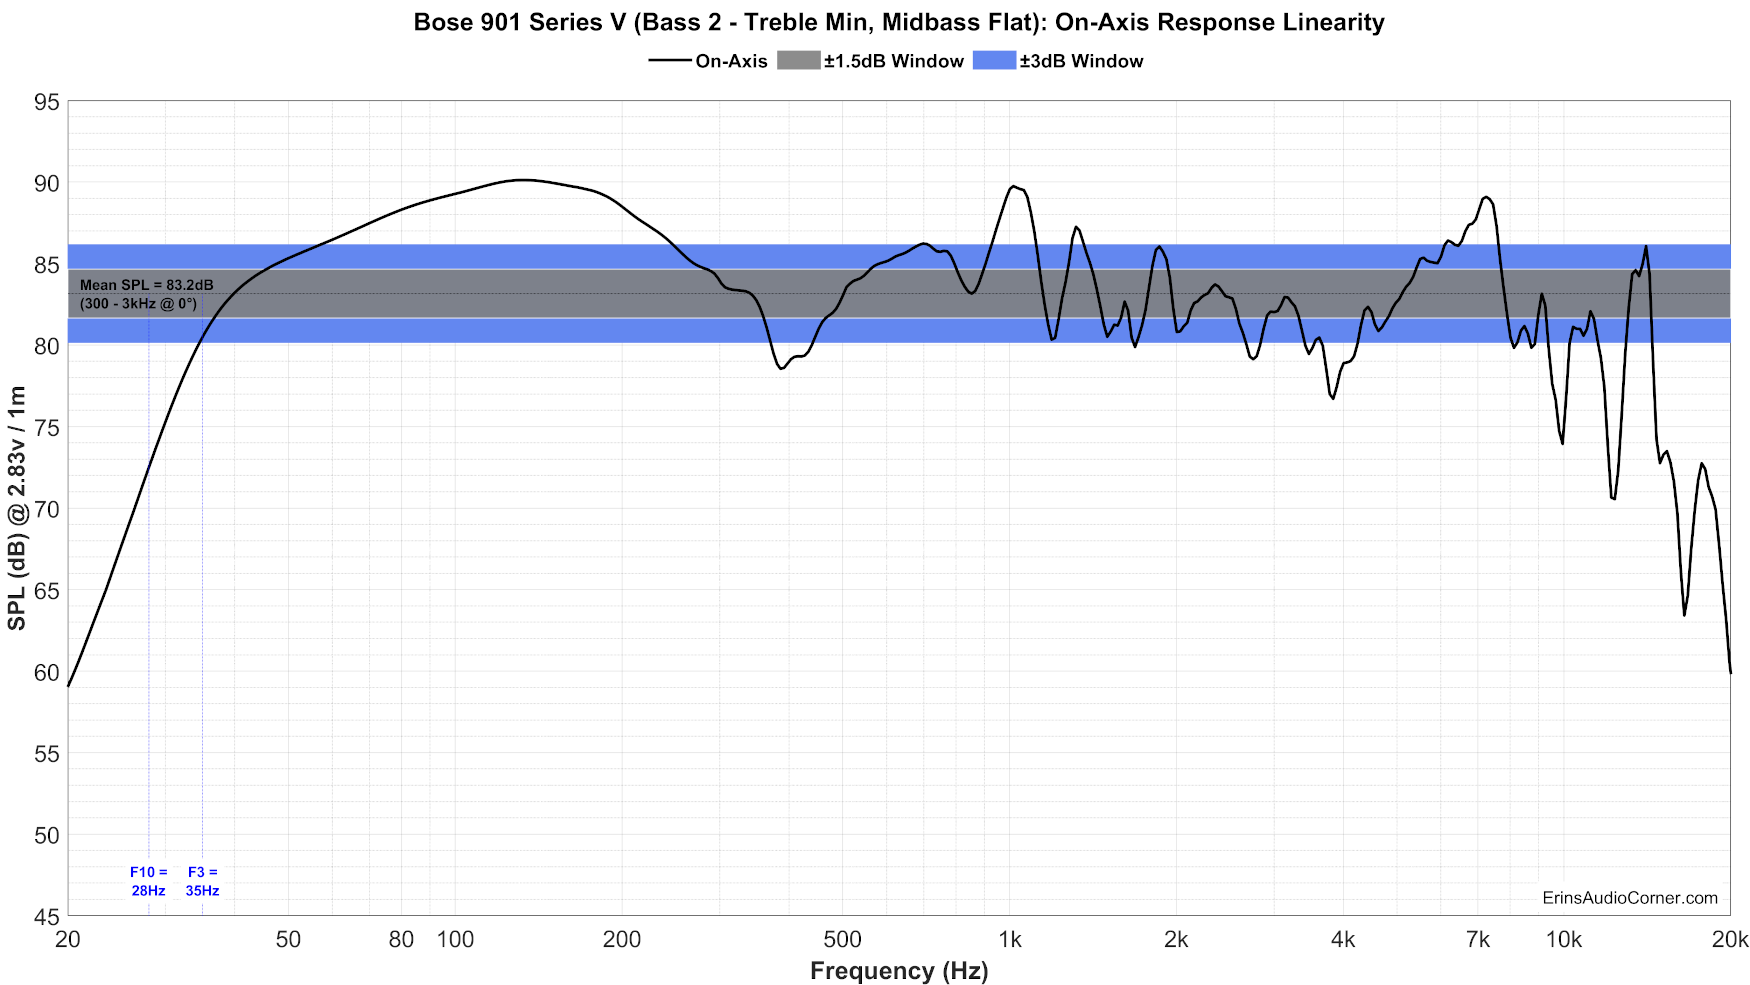 Bose%20901%20Series%20V%20(Bass%202%20-%20Treble%20Min,%20Midbass%20Flat)%20FR_Linearity.png